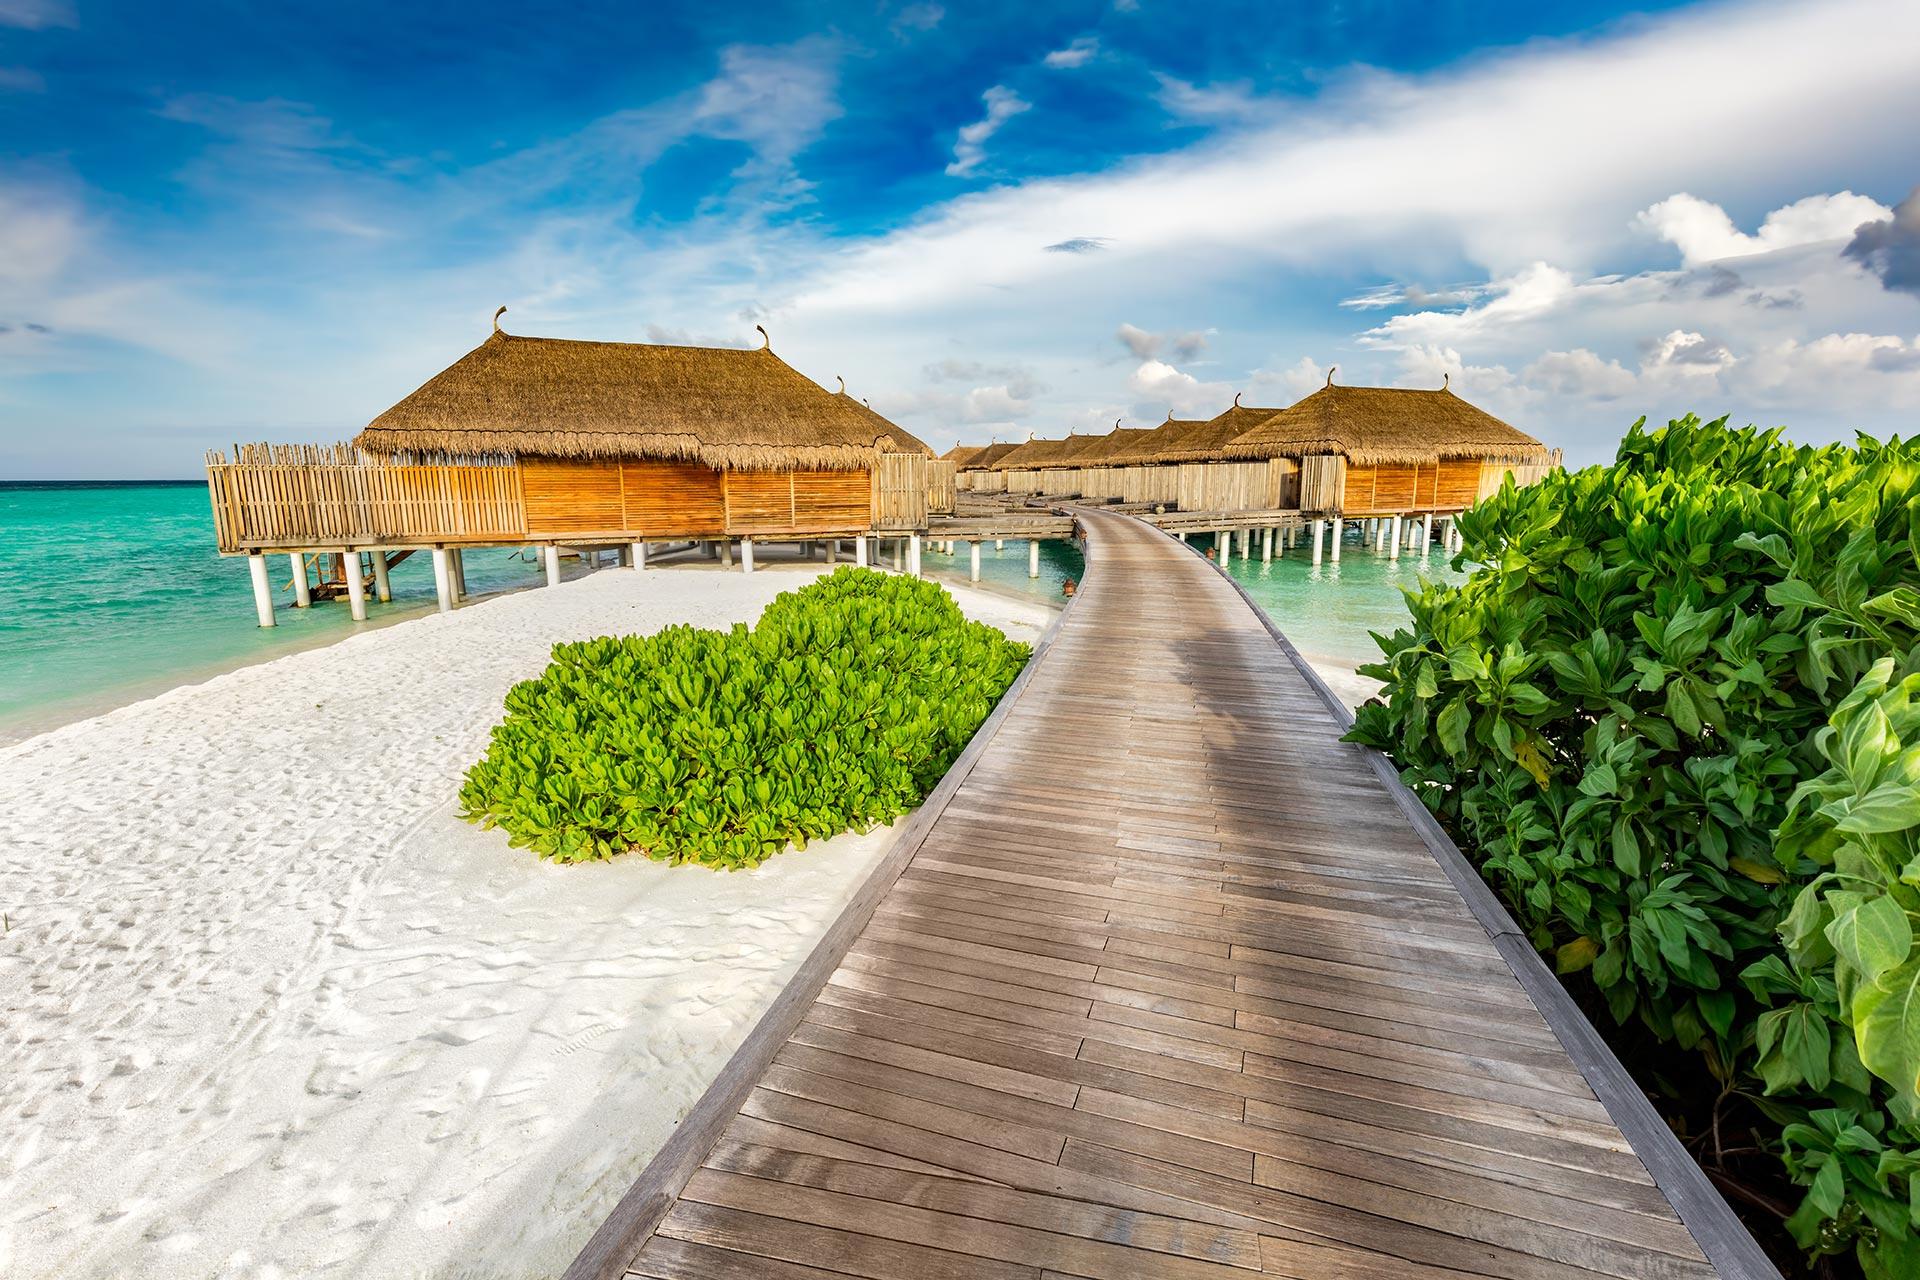 Sejur plaja Maldive, 8 zile - iulie 2021